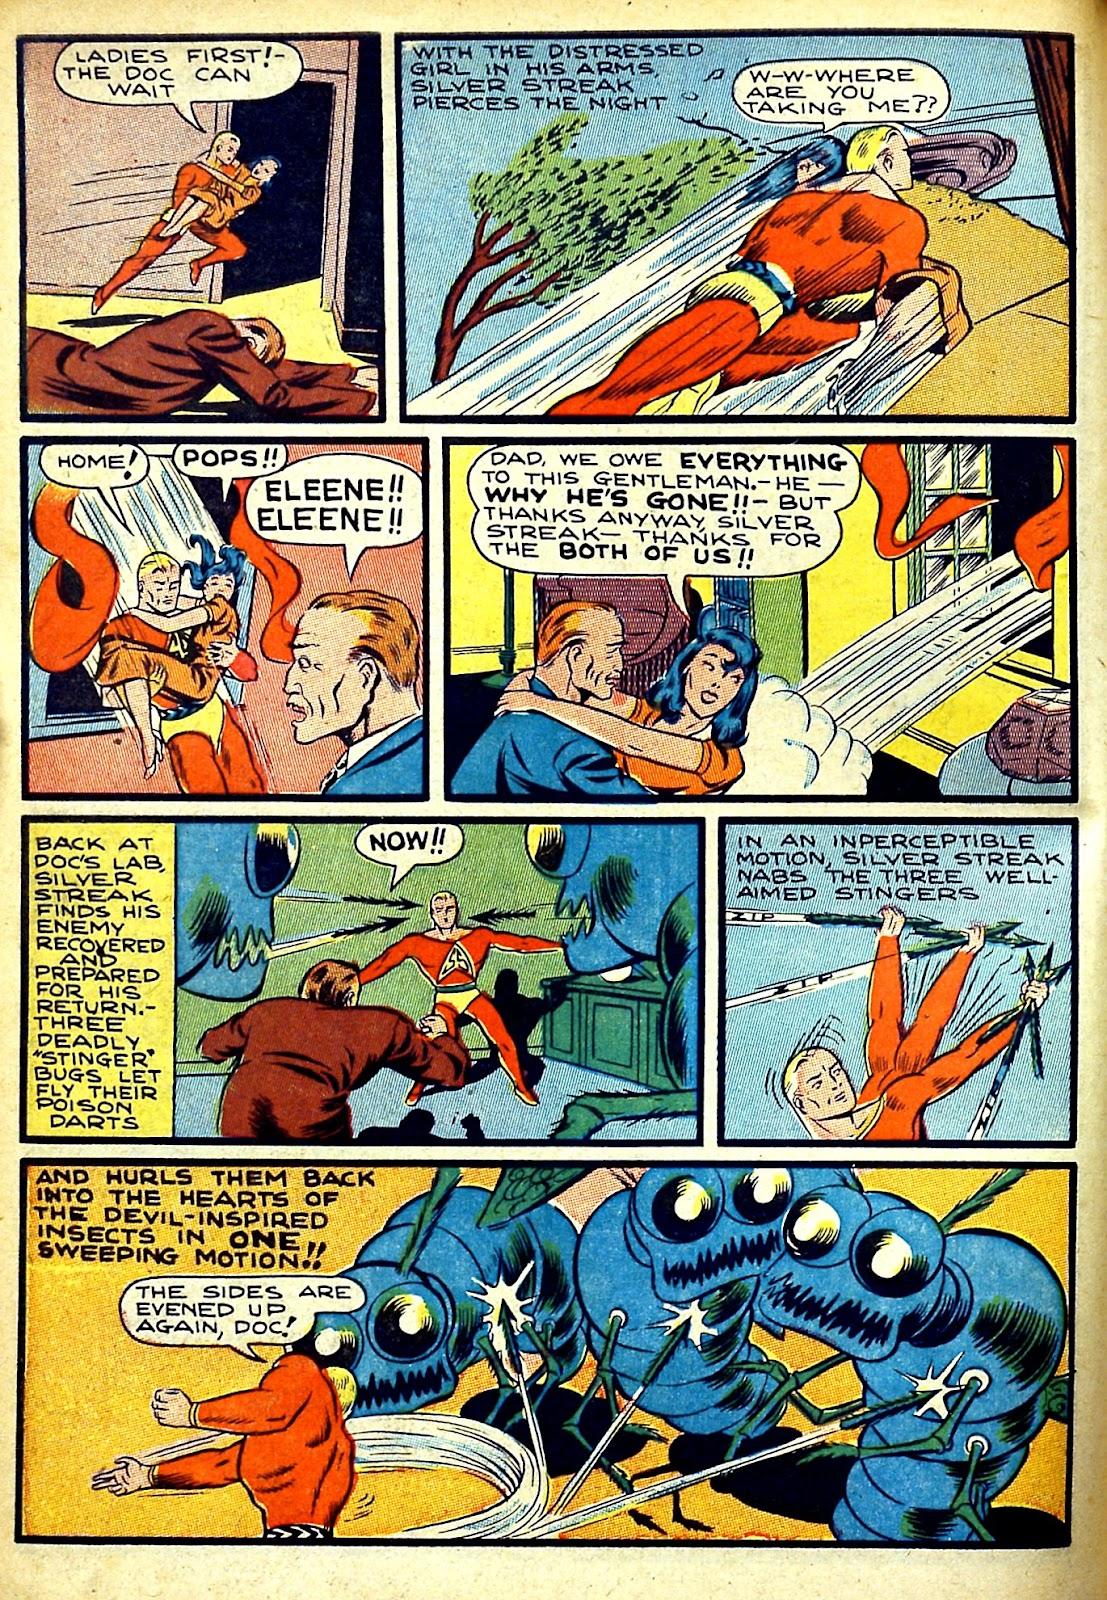 Read online Silver Streak Comics comic -  Issue #22 - 8